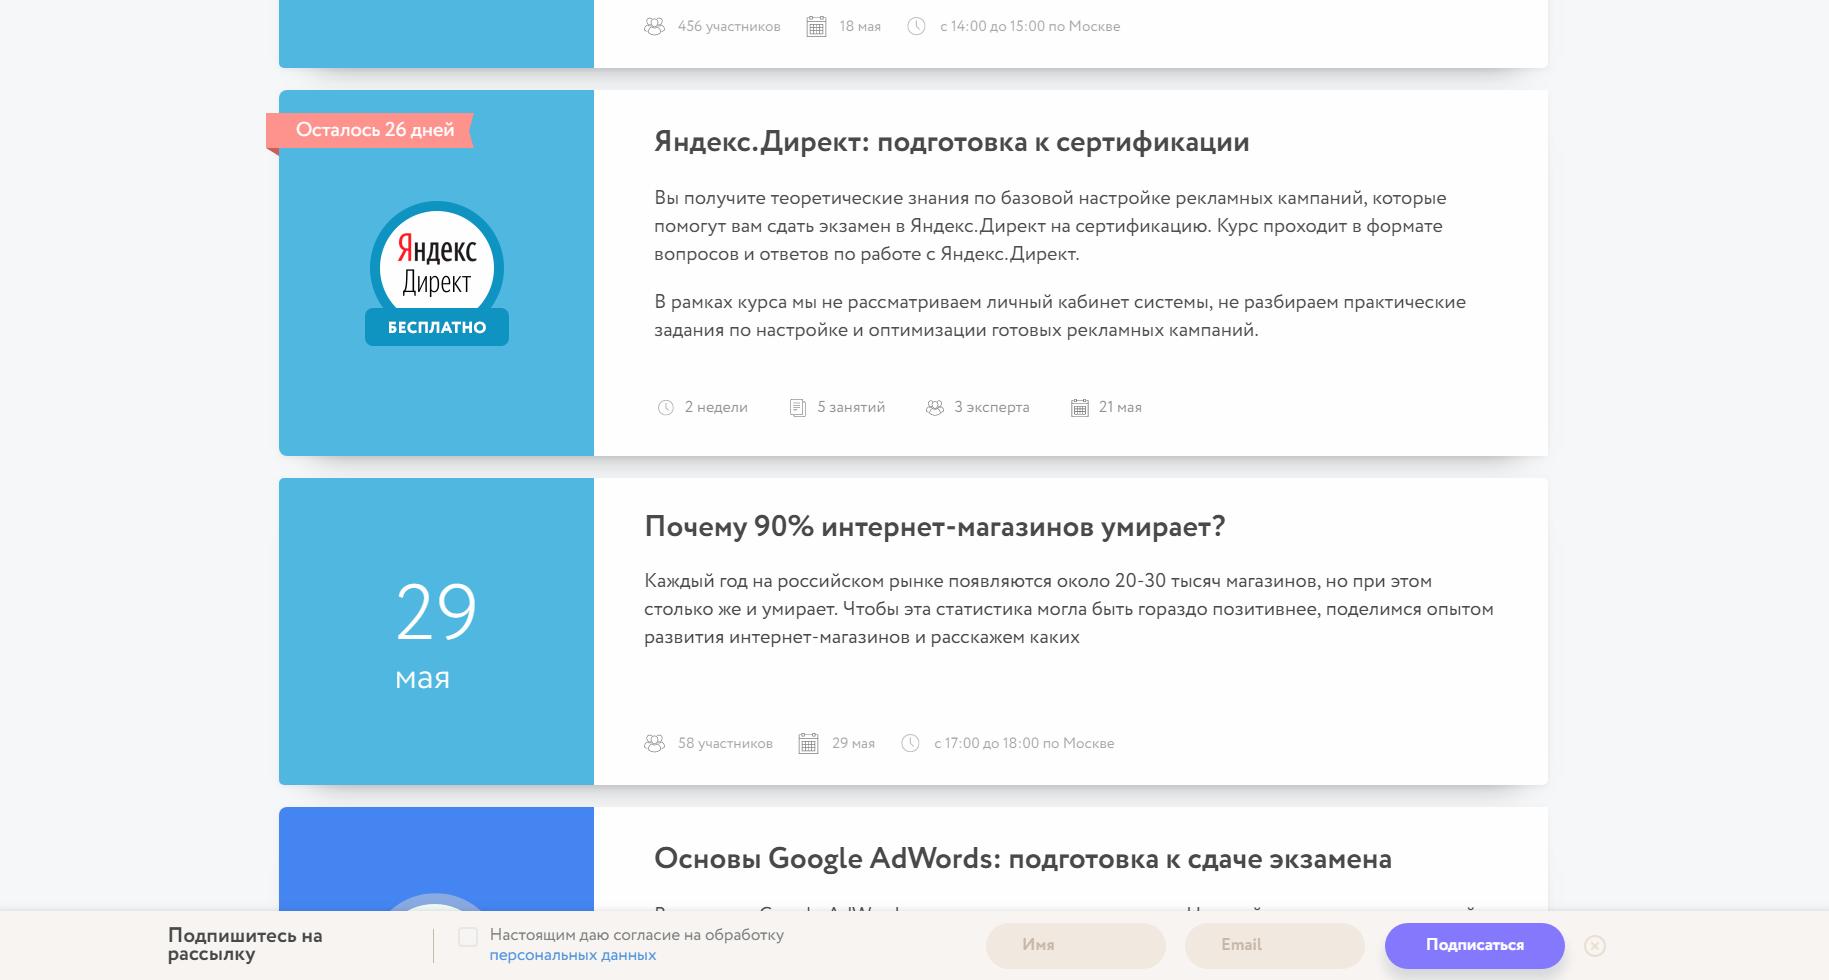 Поп-ап от Яндекс.Директ